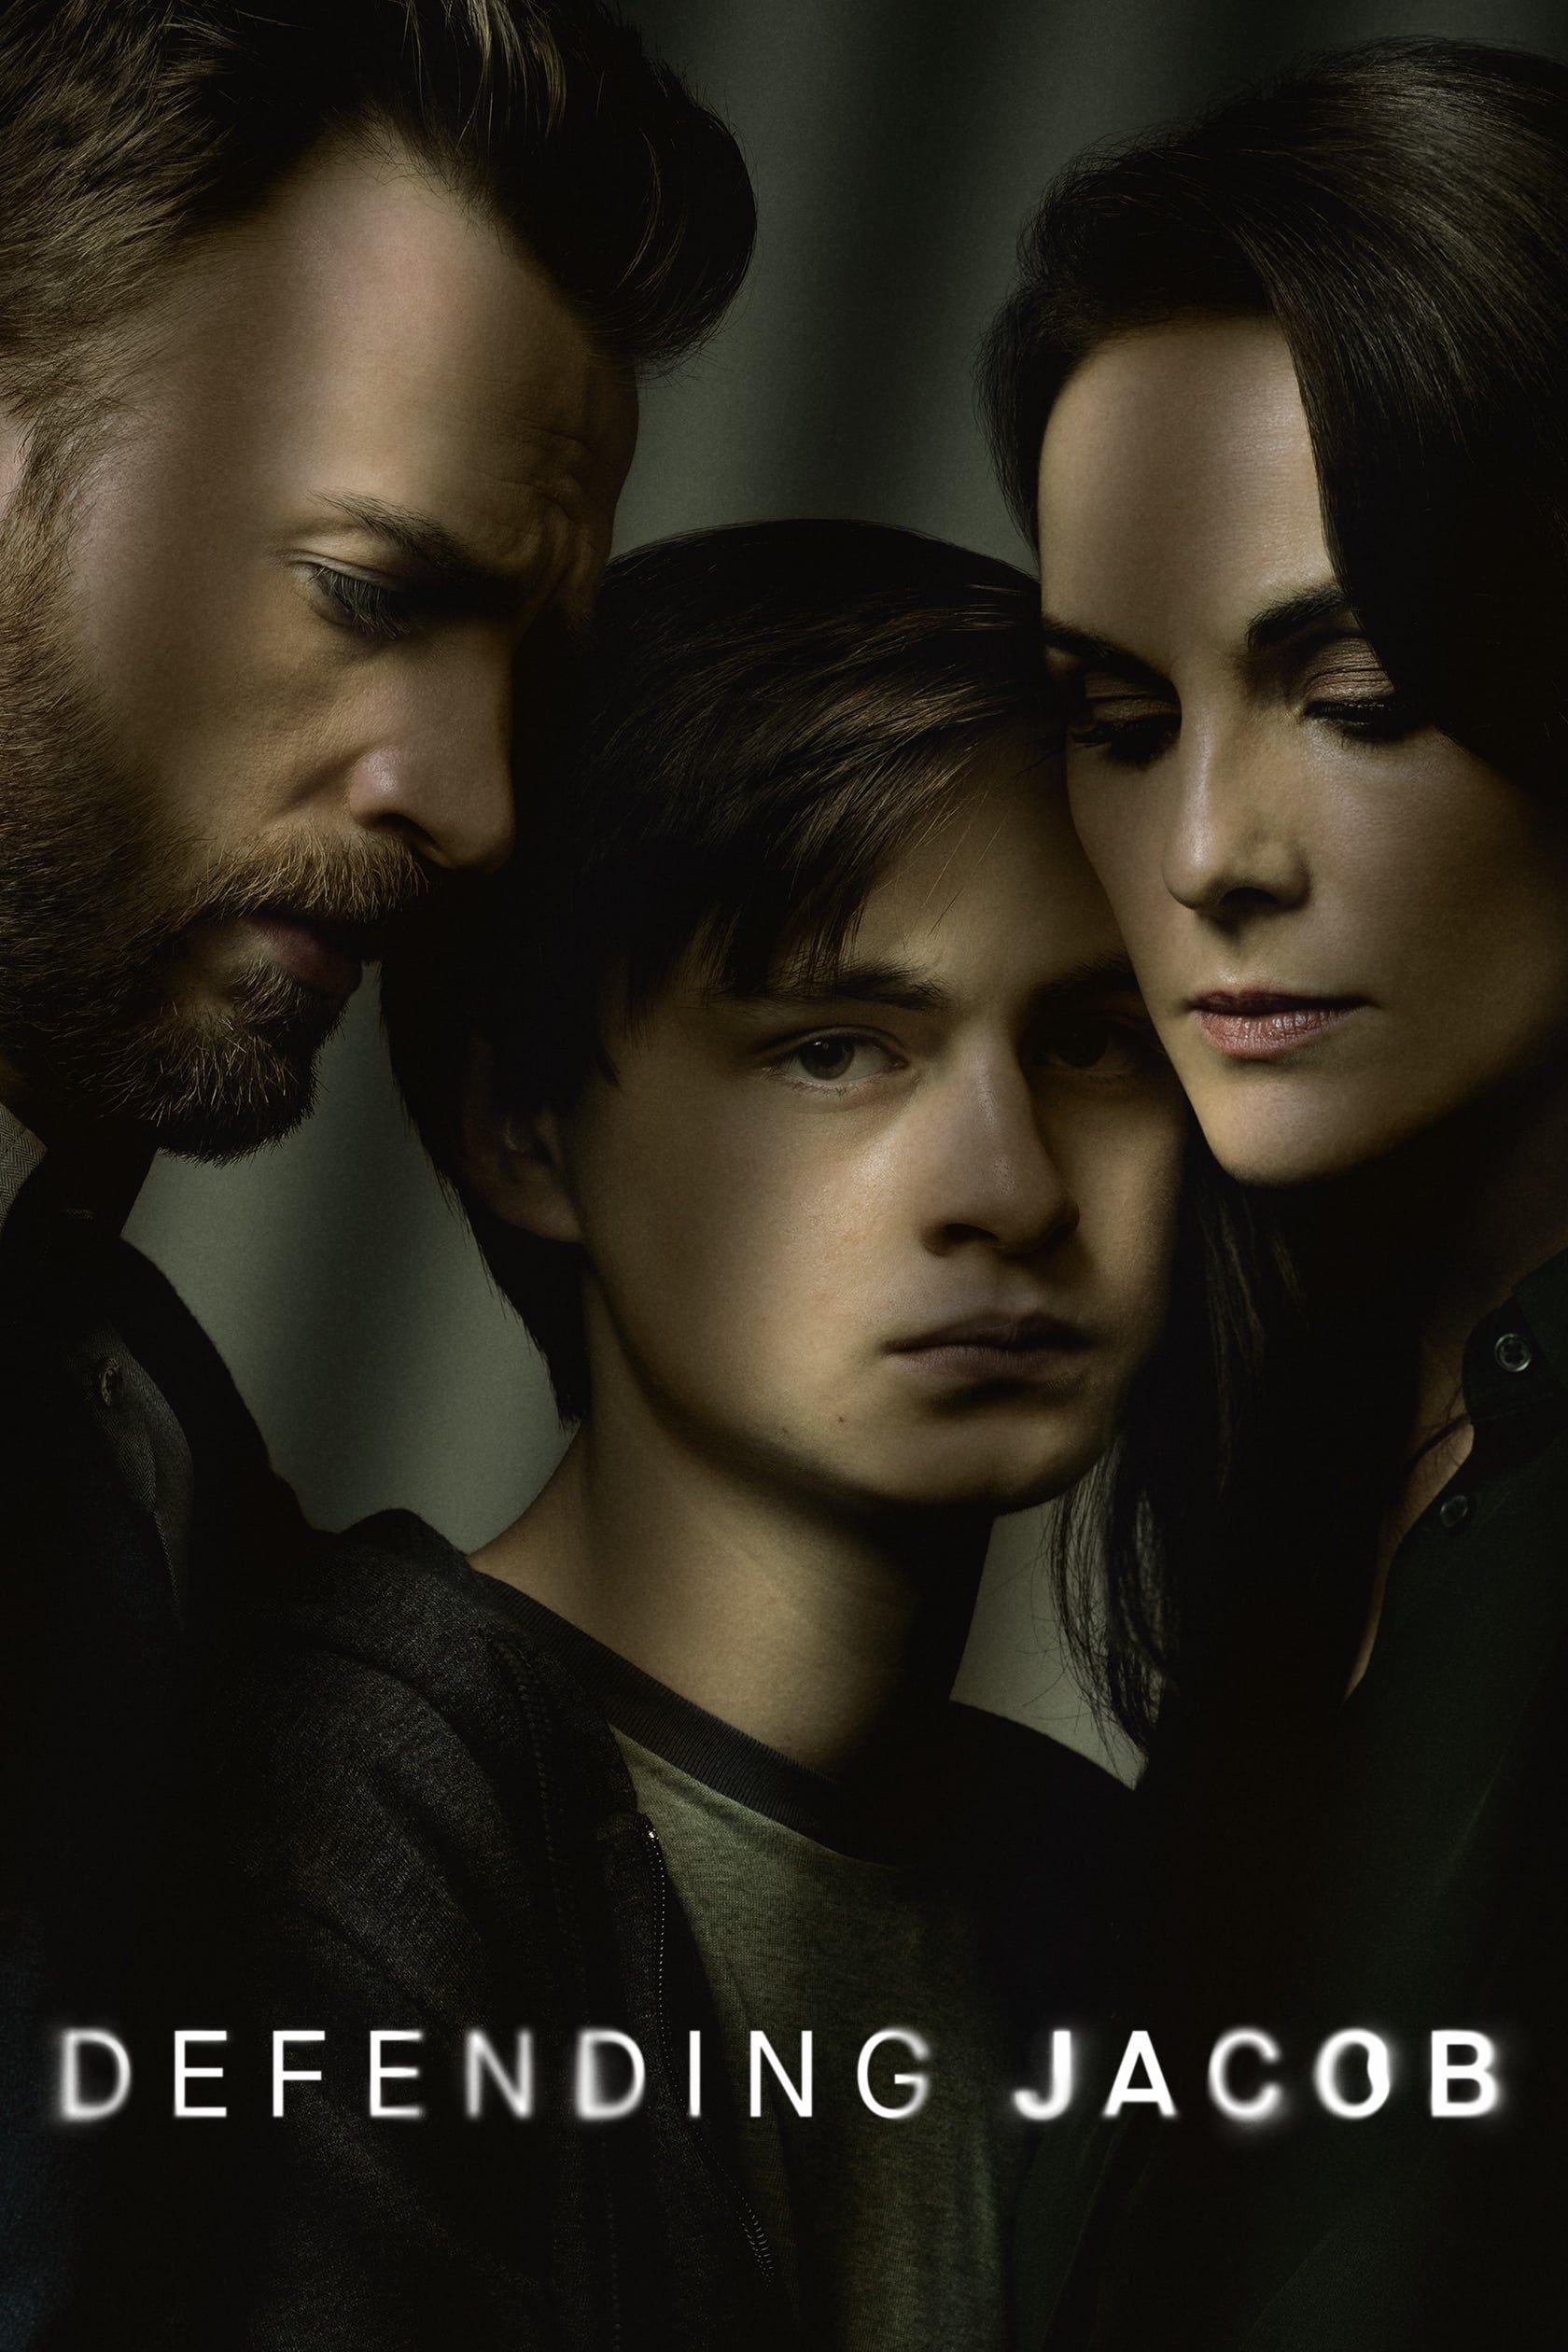 The Son Saison 1 Streaming Vf : saison, streaming, Brokensilenze.su, Ideas, Shows, Online,, Movies, Series, Online